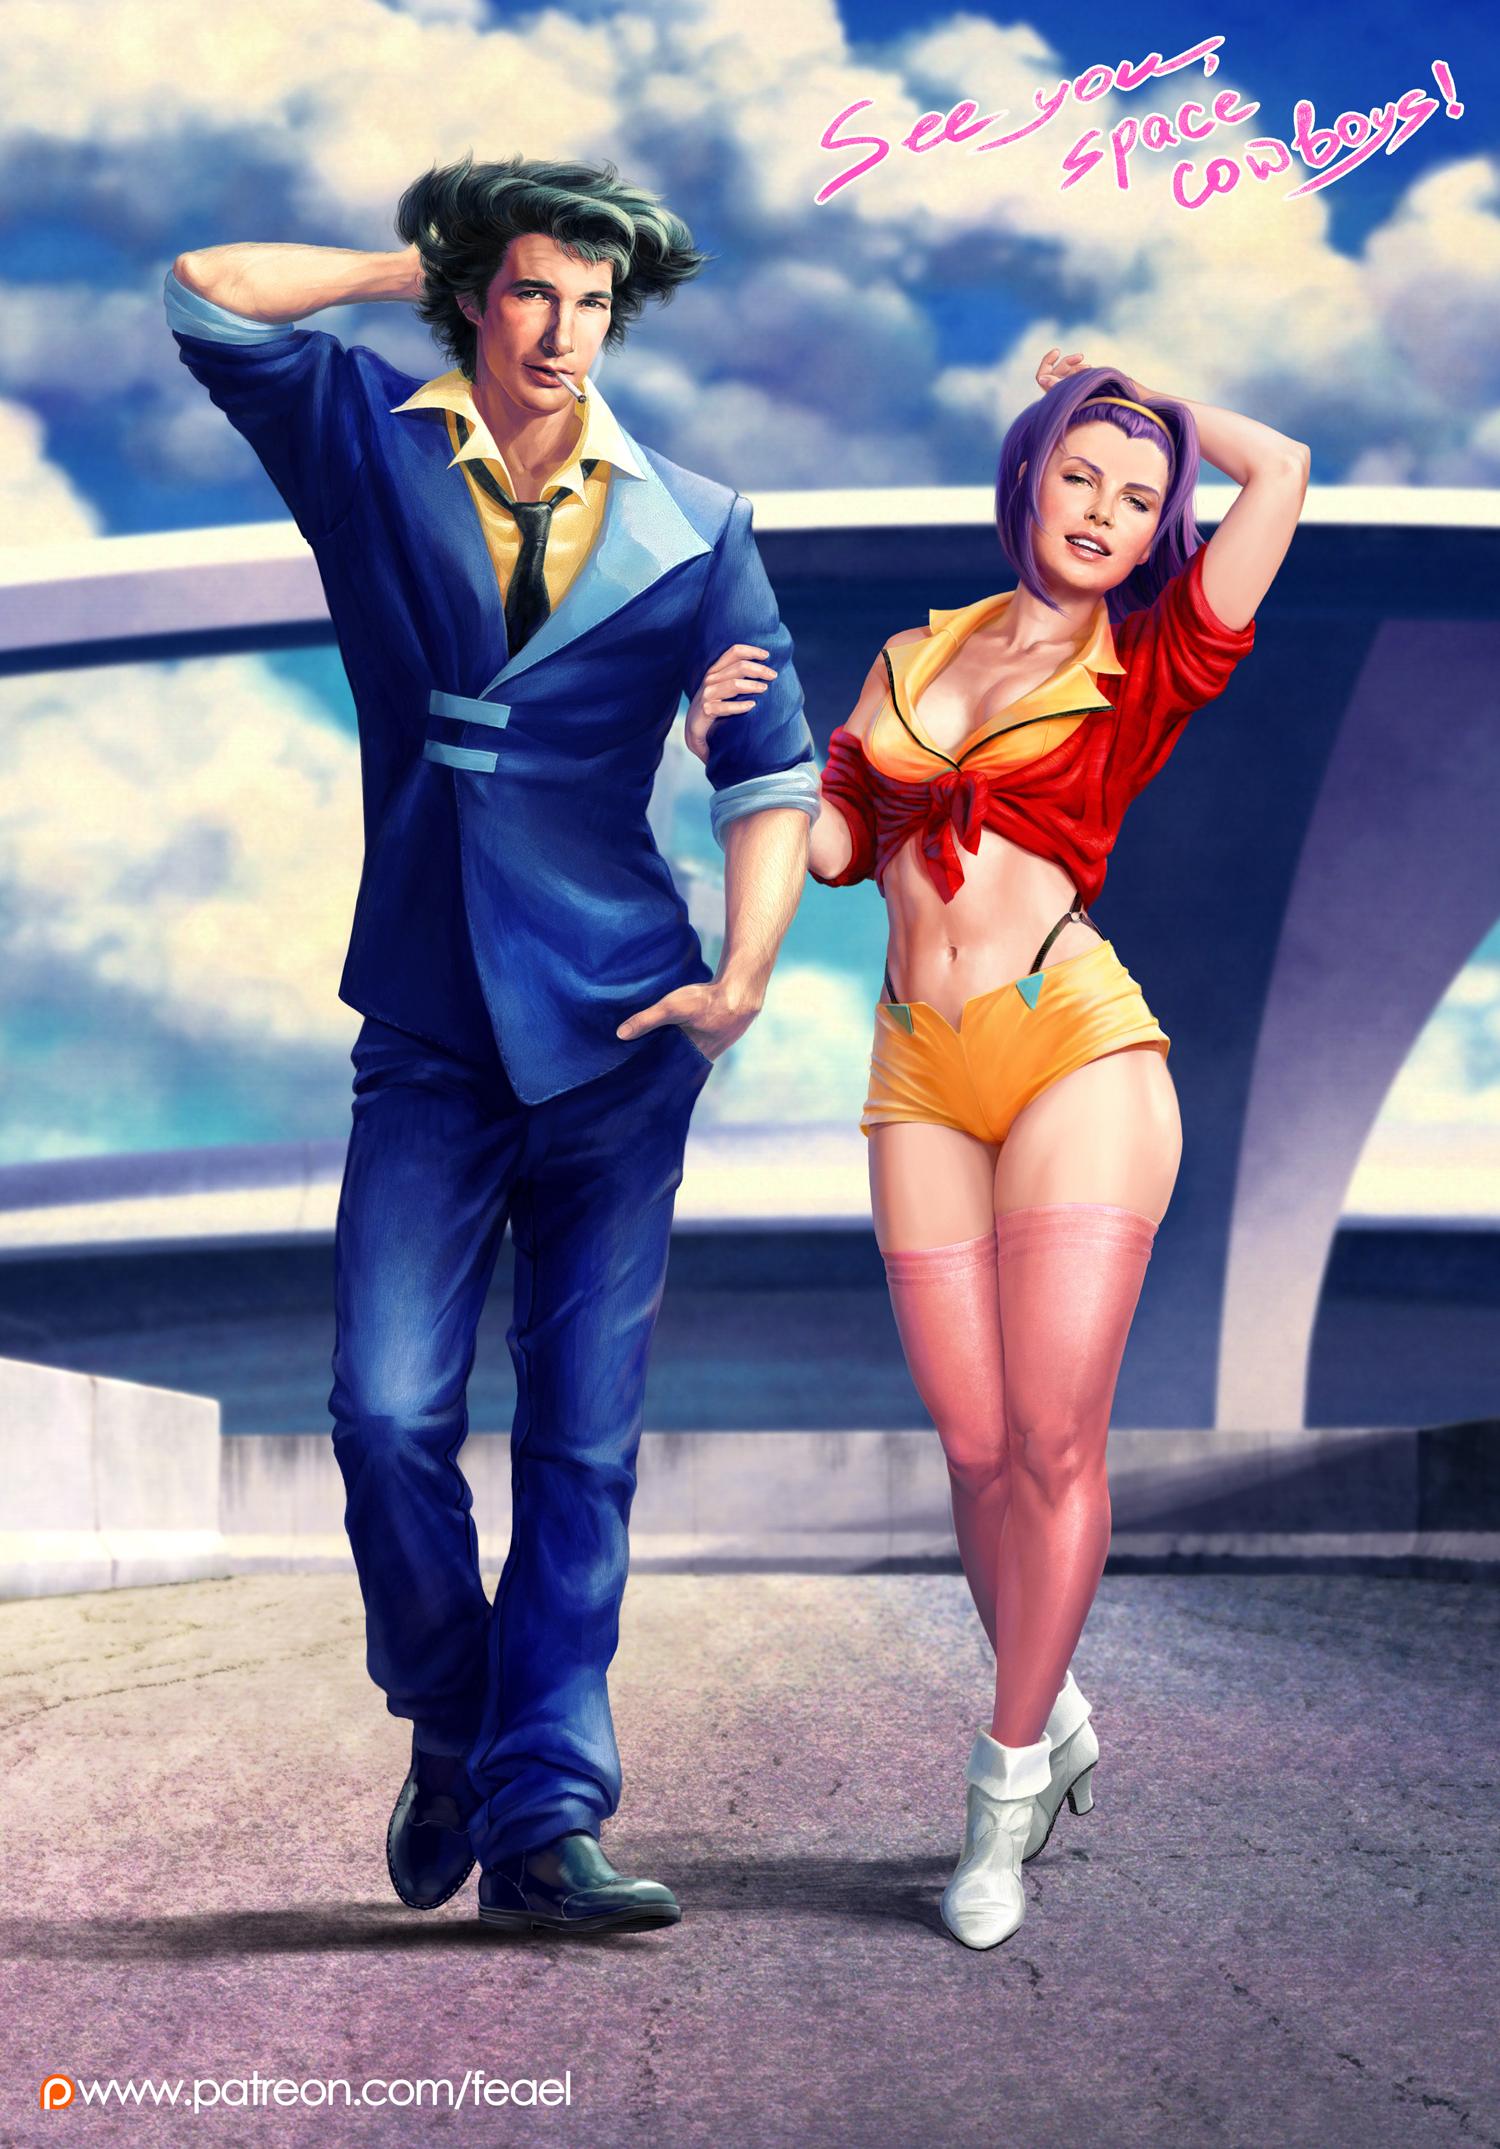 Faye and Spike